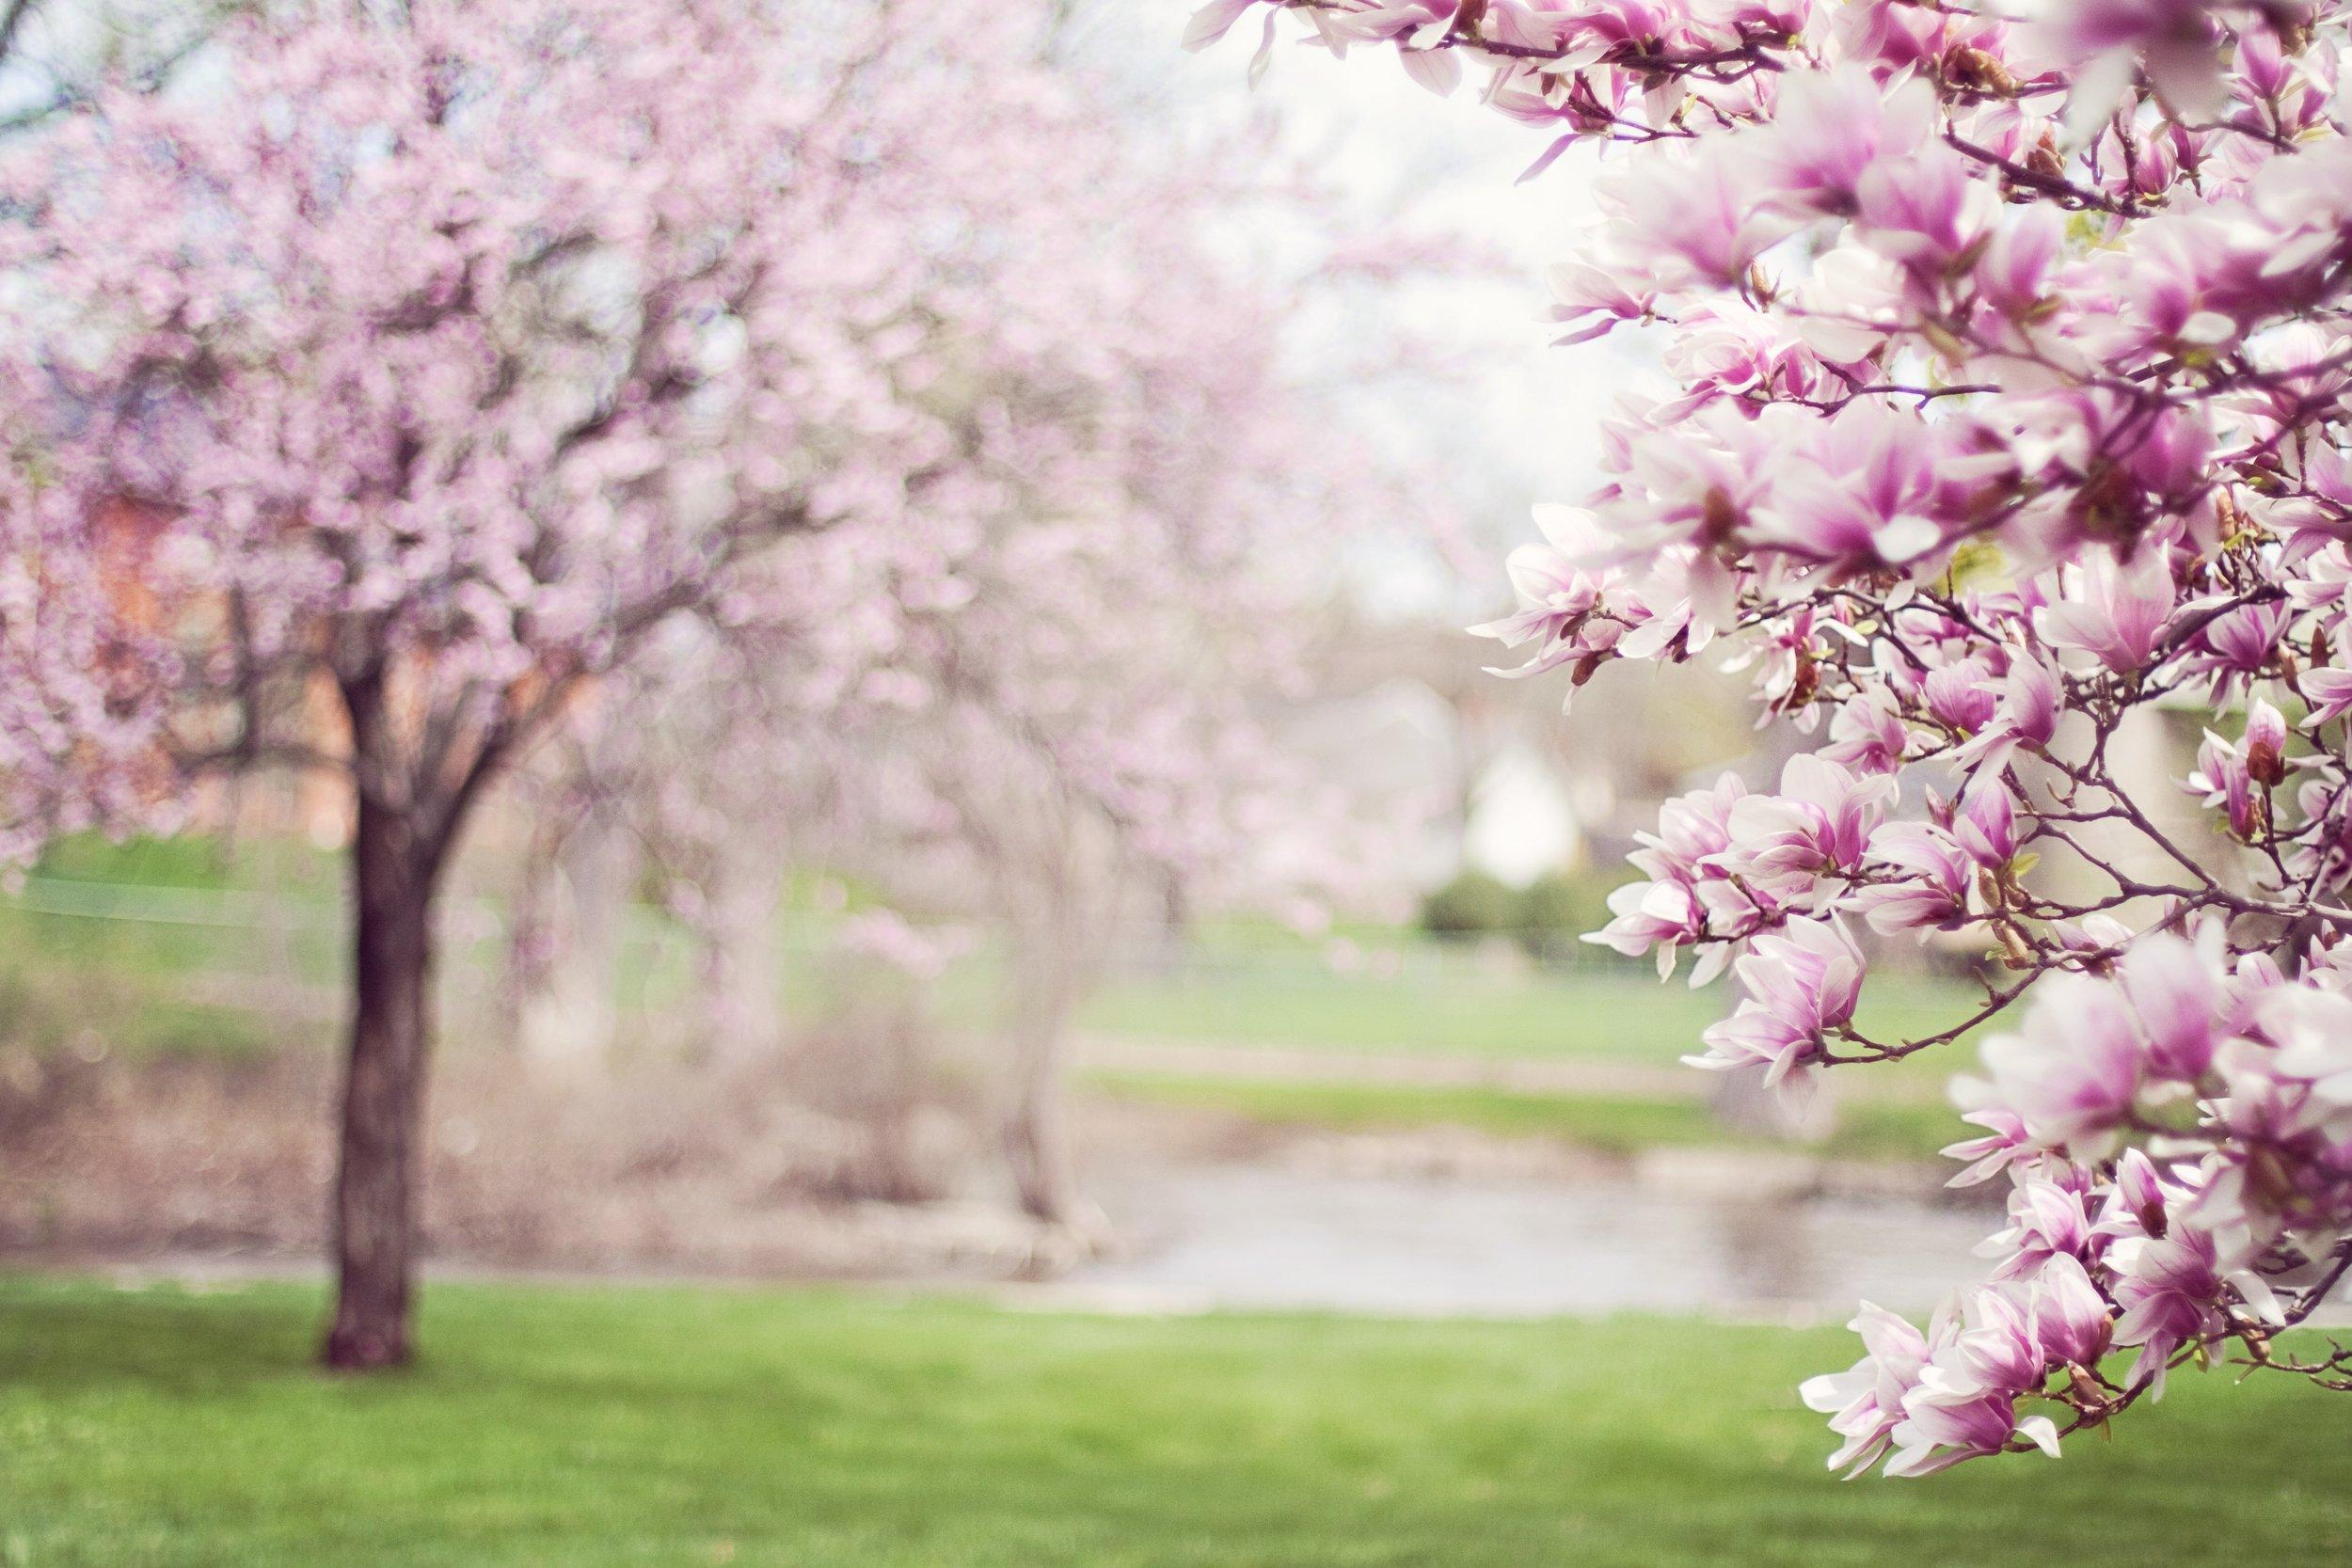 tree-branch-blossom-plant-flower-spring-1088339-pxhere.com.jpg